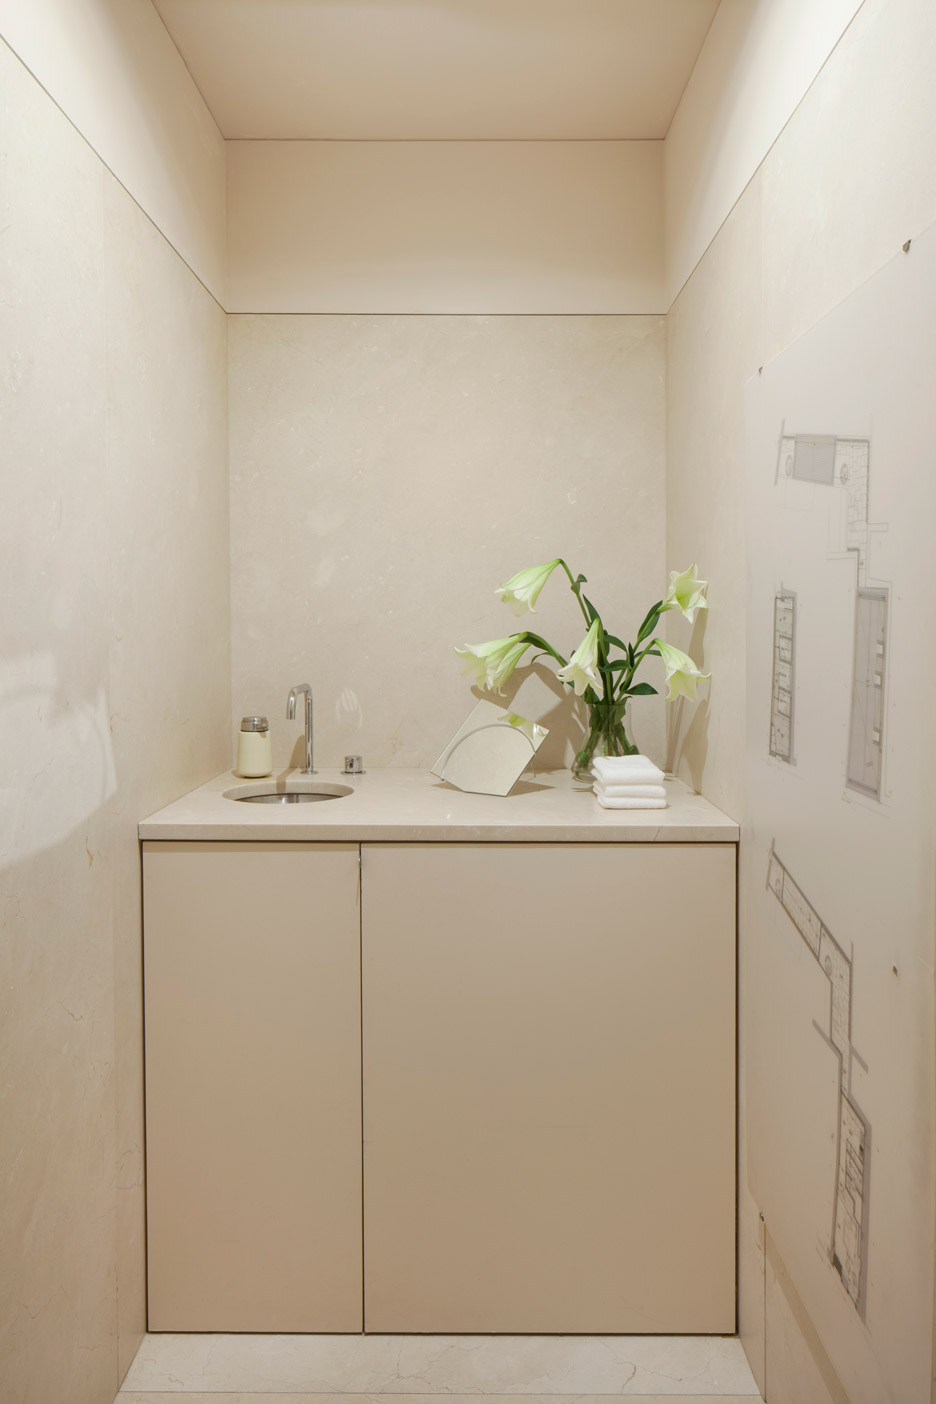 Architecture-courtyard-design-studia-interiors-osnovadesign-osnova-poltava-15